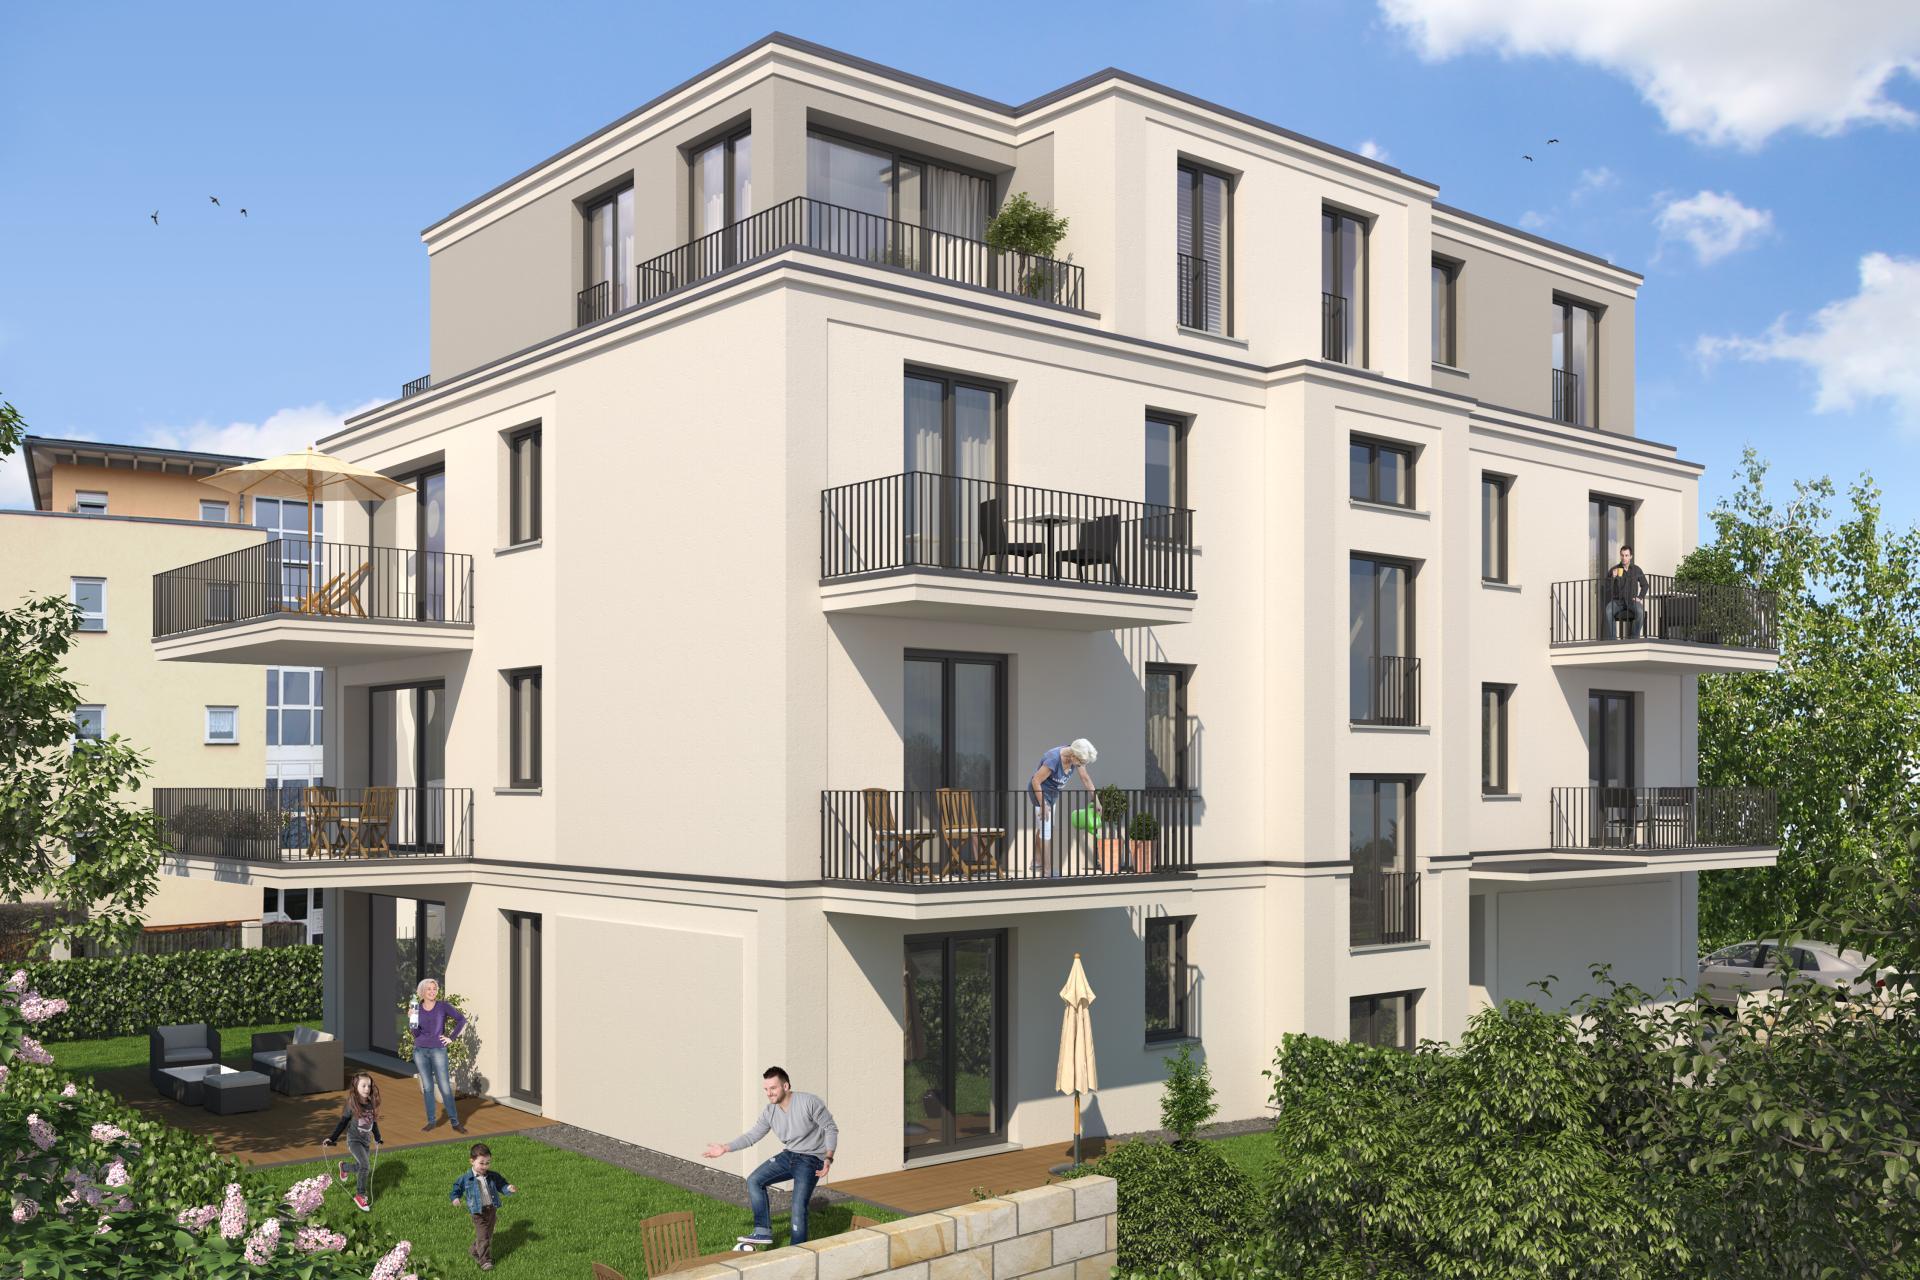 Klassische Villa Neubau pes7 – neubau mehrfamilienhaus als klassische villa – tssb